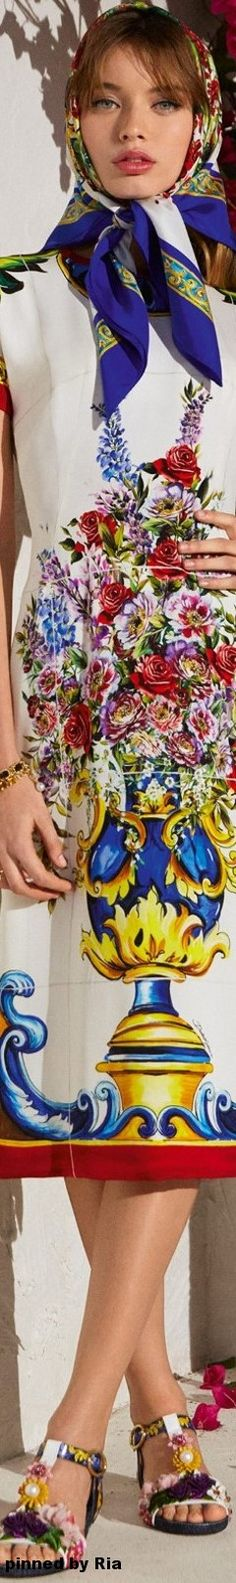 Dolce & Gabbana Caltagirone Collection l Ria